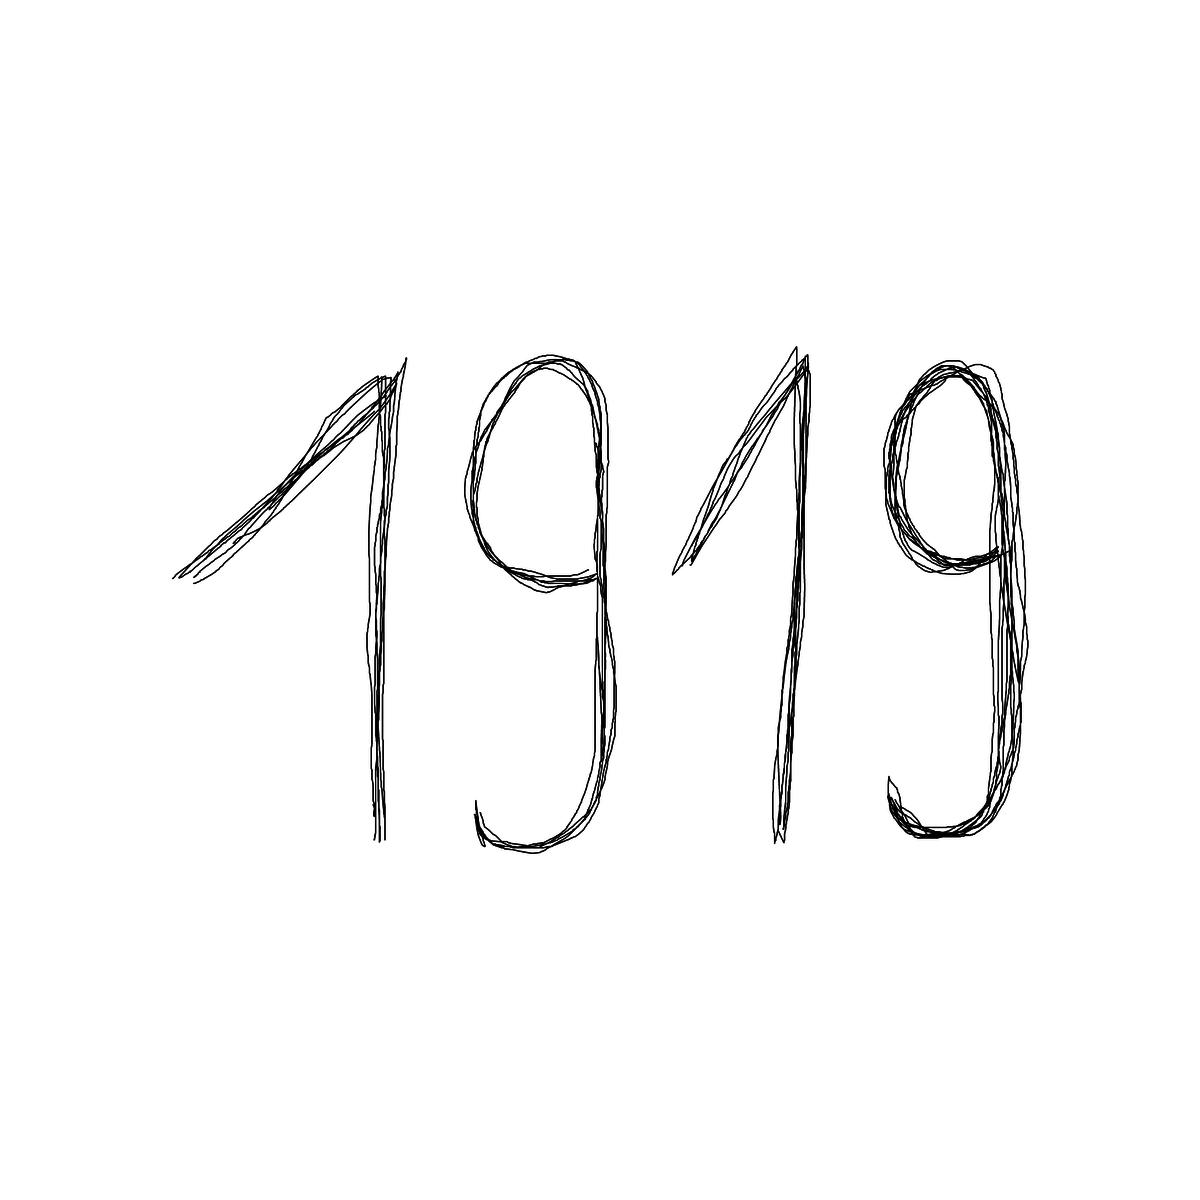 BAAAM drawing#18977 lat:50.2635917663574200lng: 19.0240173339843750